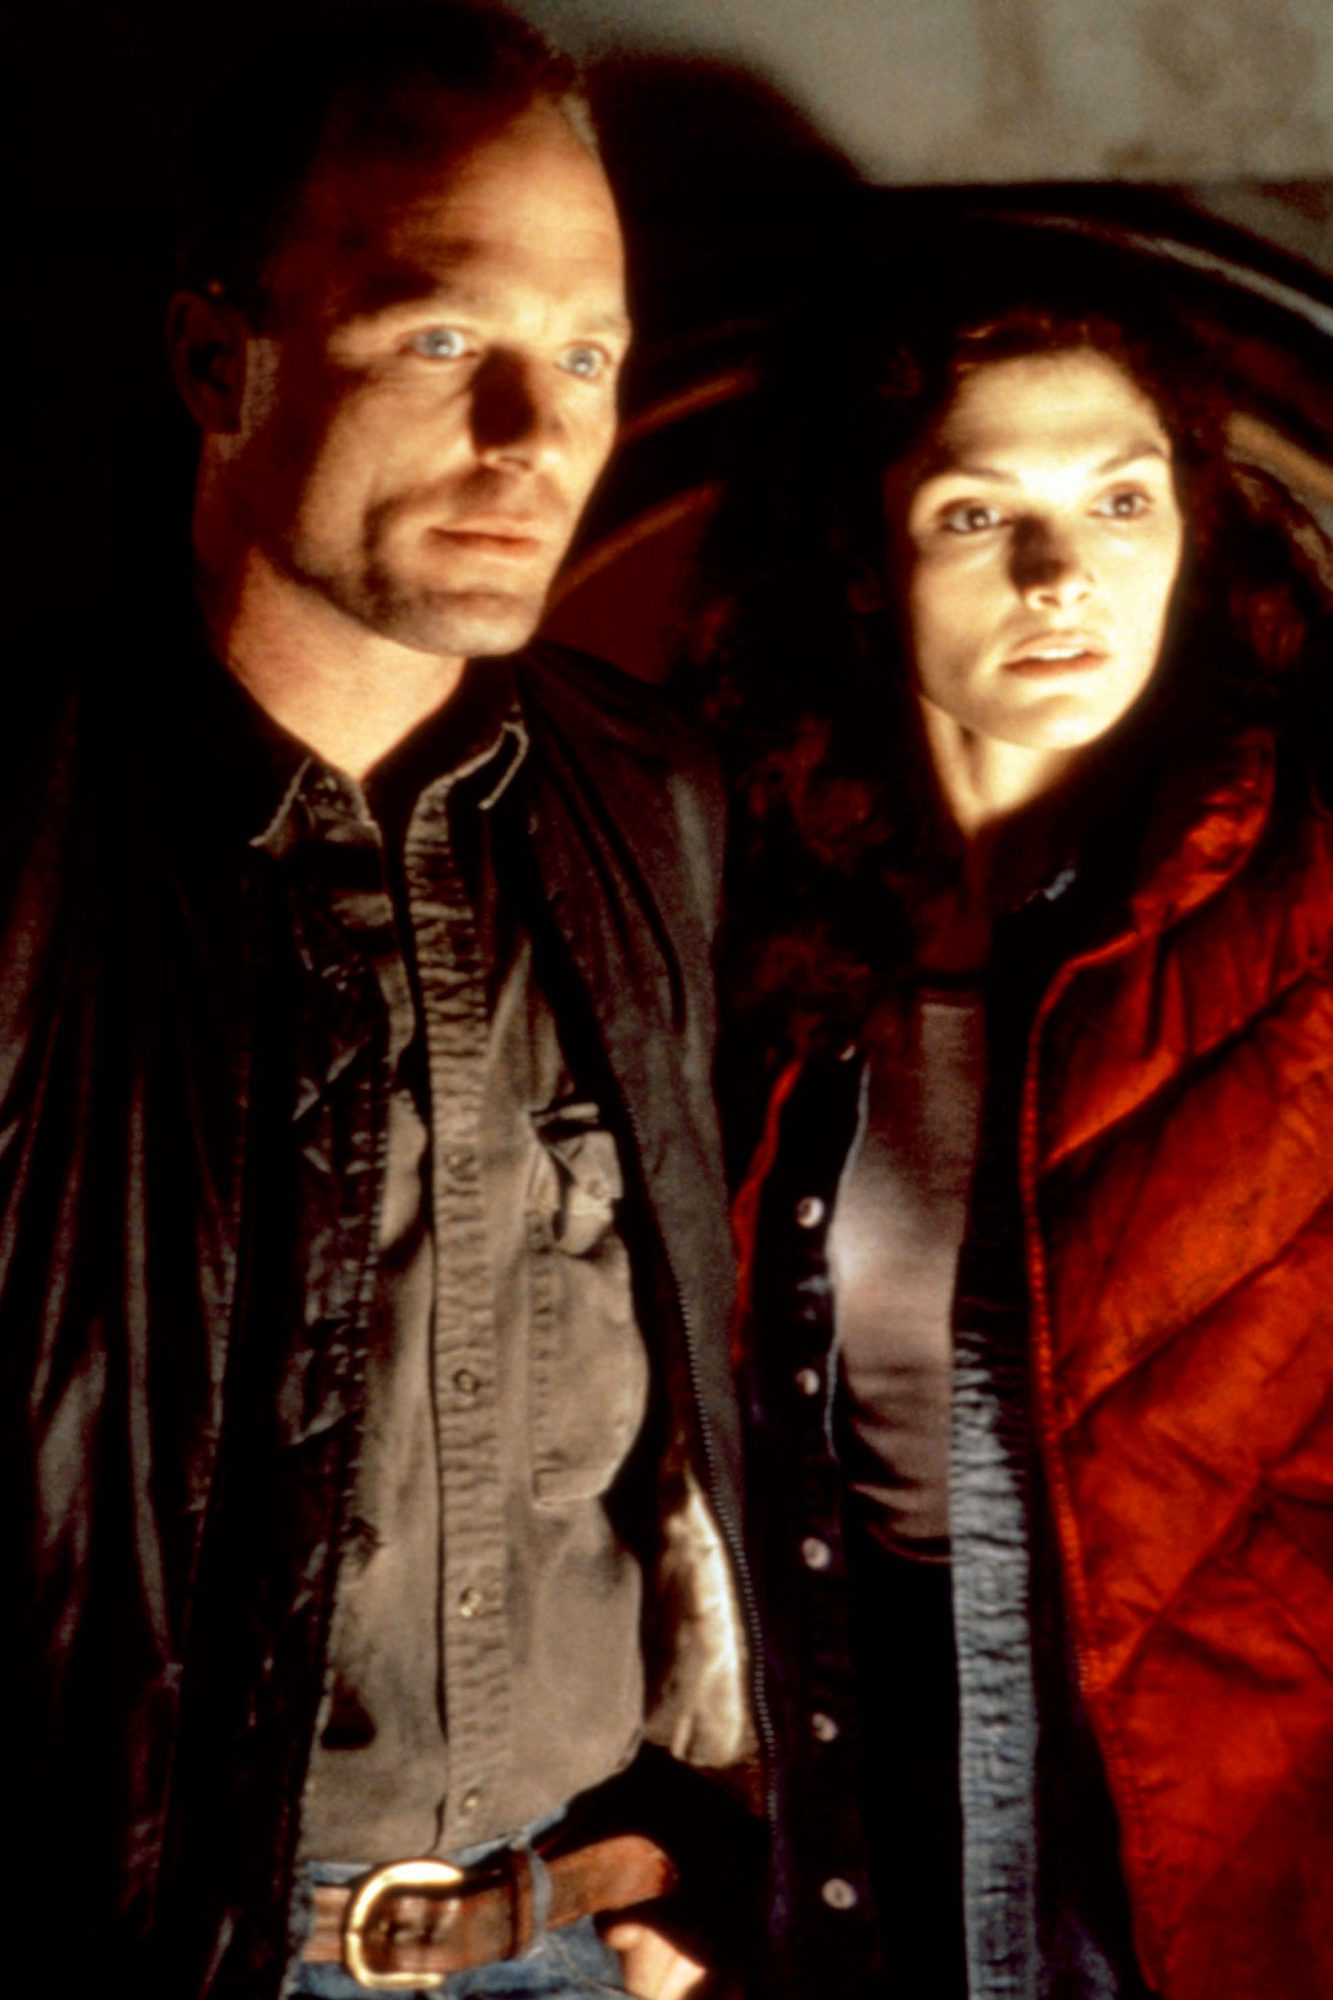 THE ABYSS, Ed Harris, Mary Elizabeth Mastrantonio, 1989, TM and Copyright (c)20th Century Fox Film C